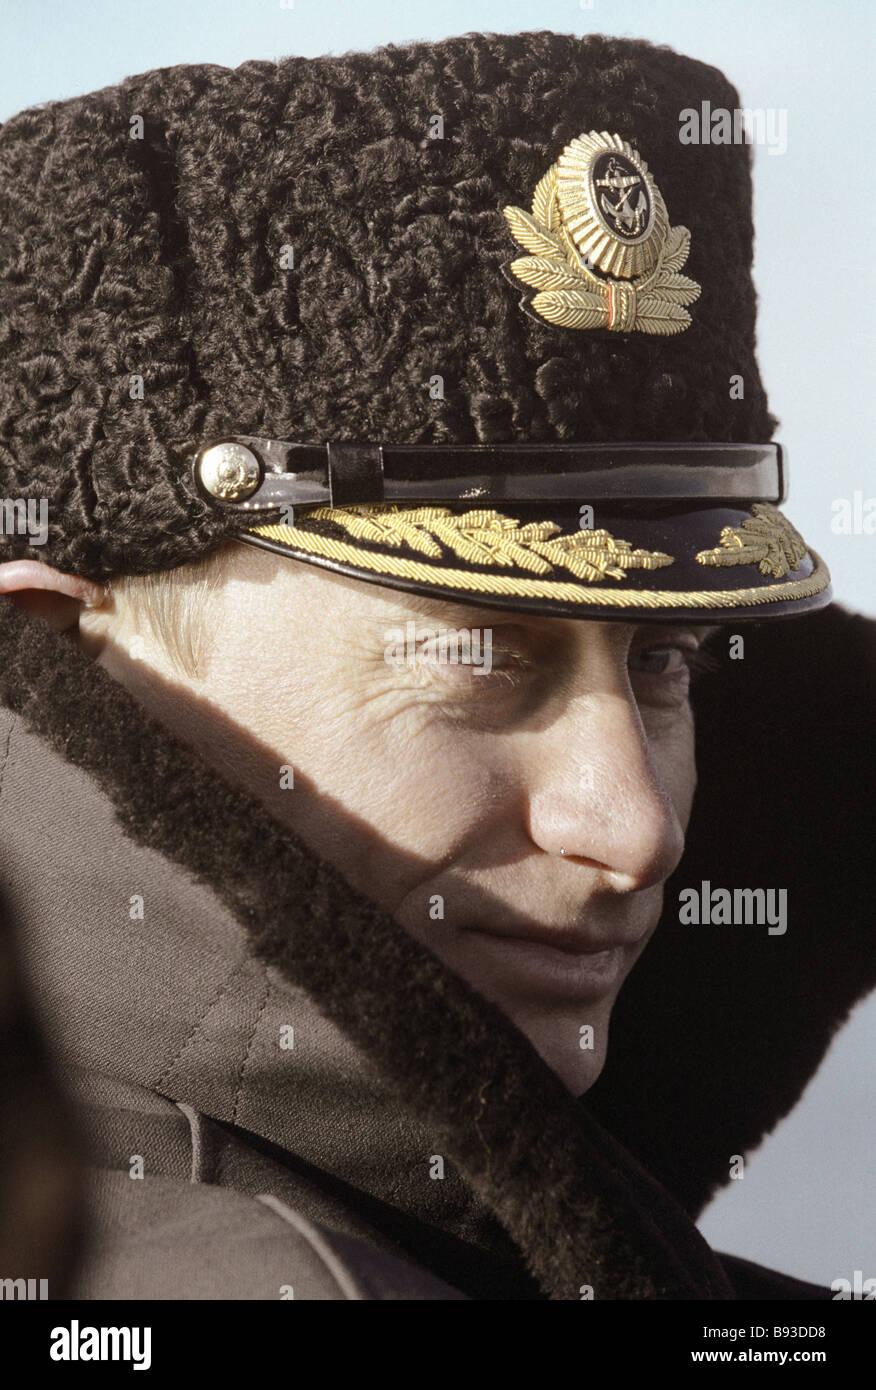 Russian Acting President Vladimir Putin aboard the nuclear powered submarine Karelia - Stock Image